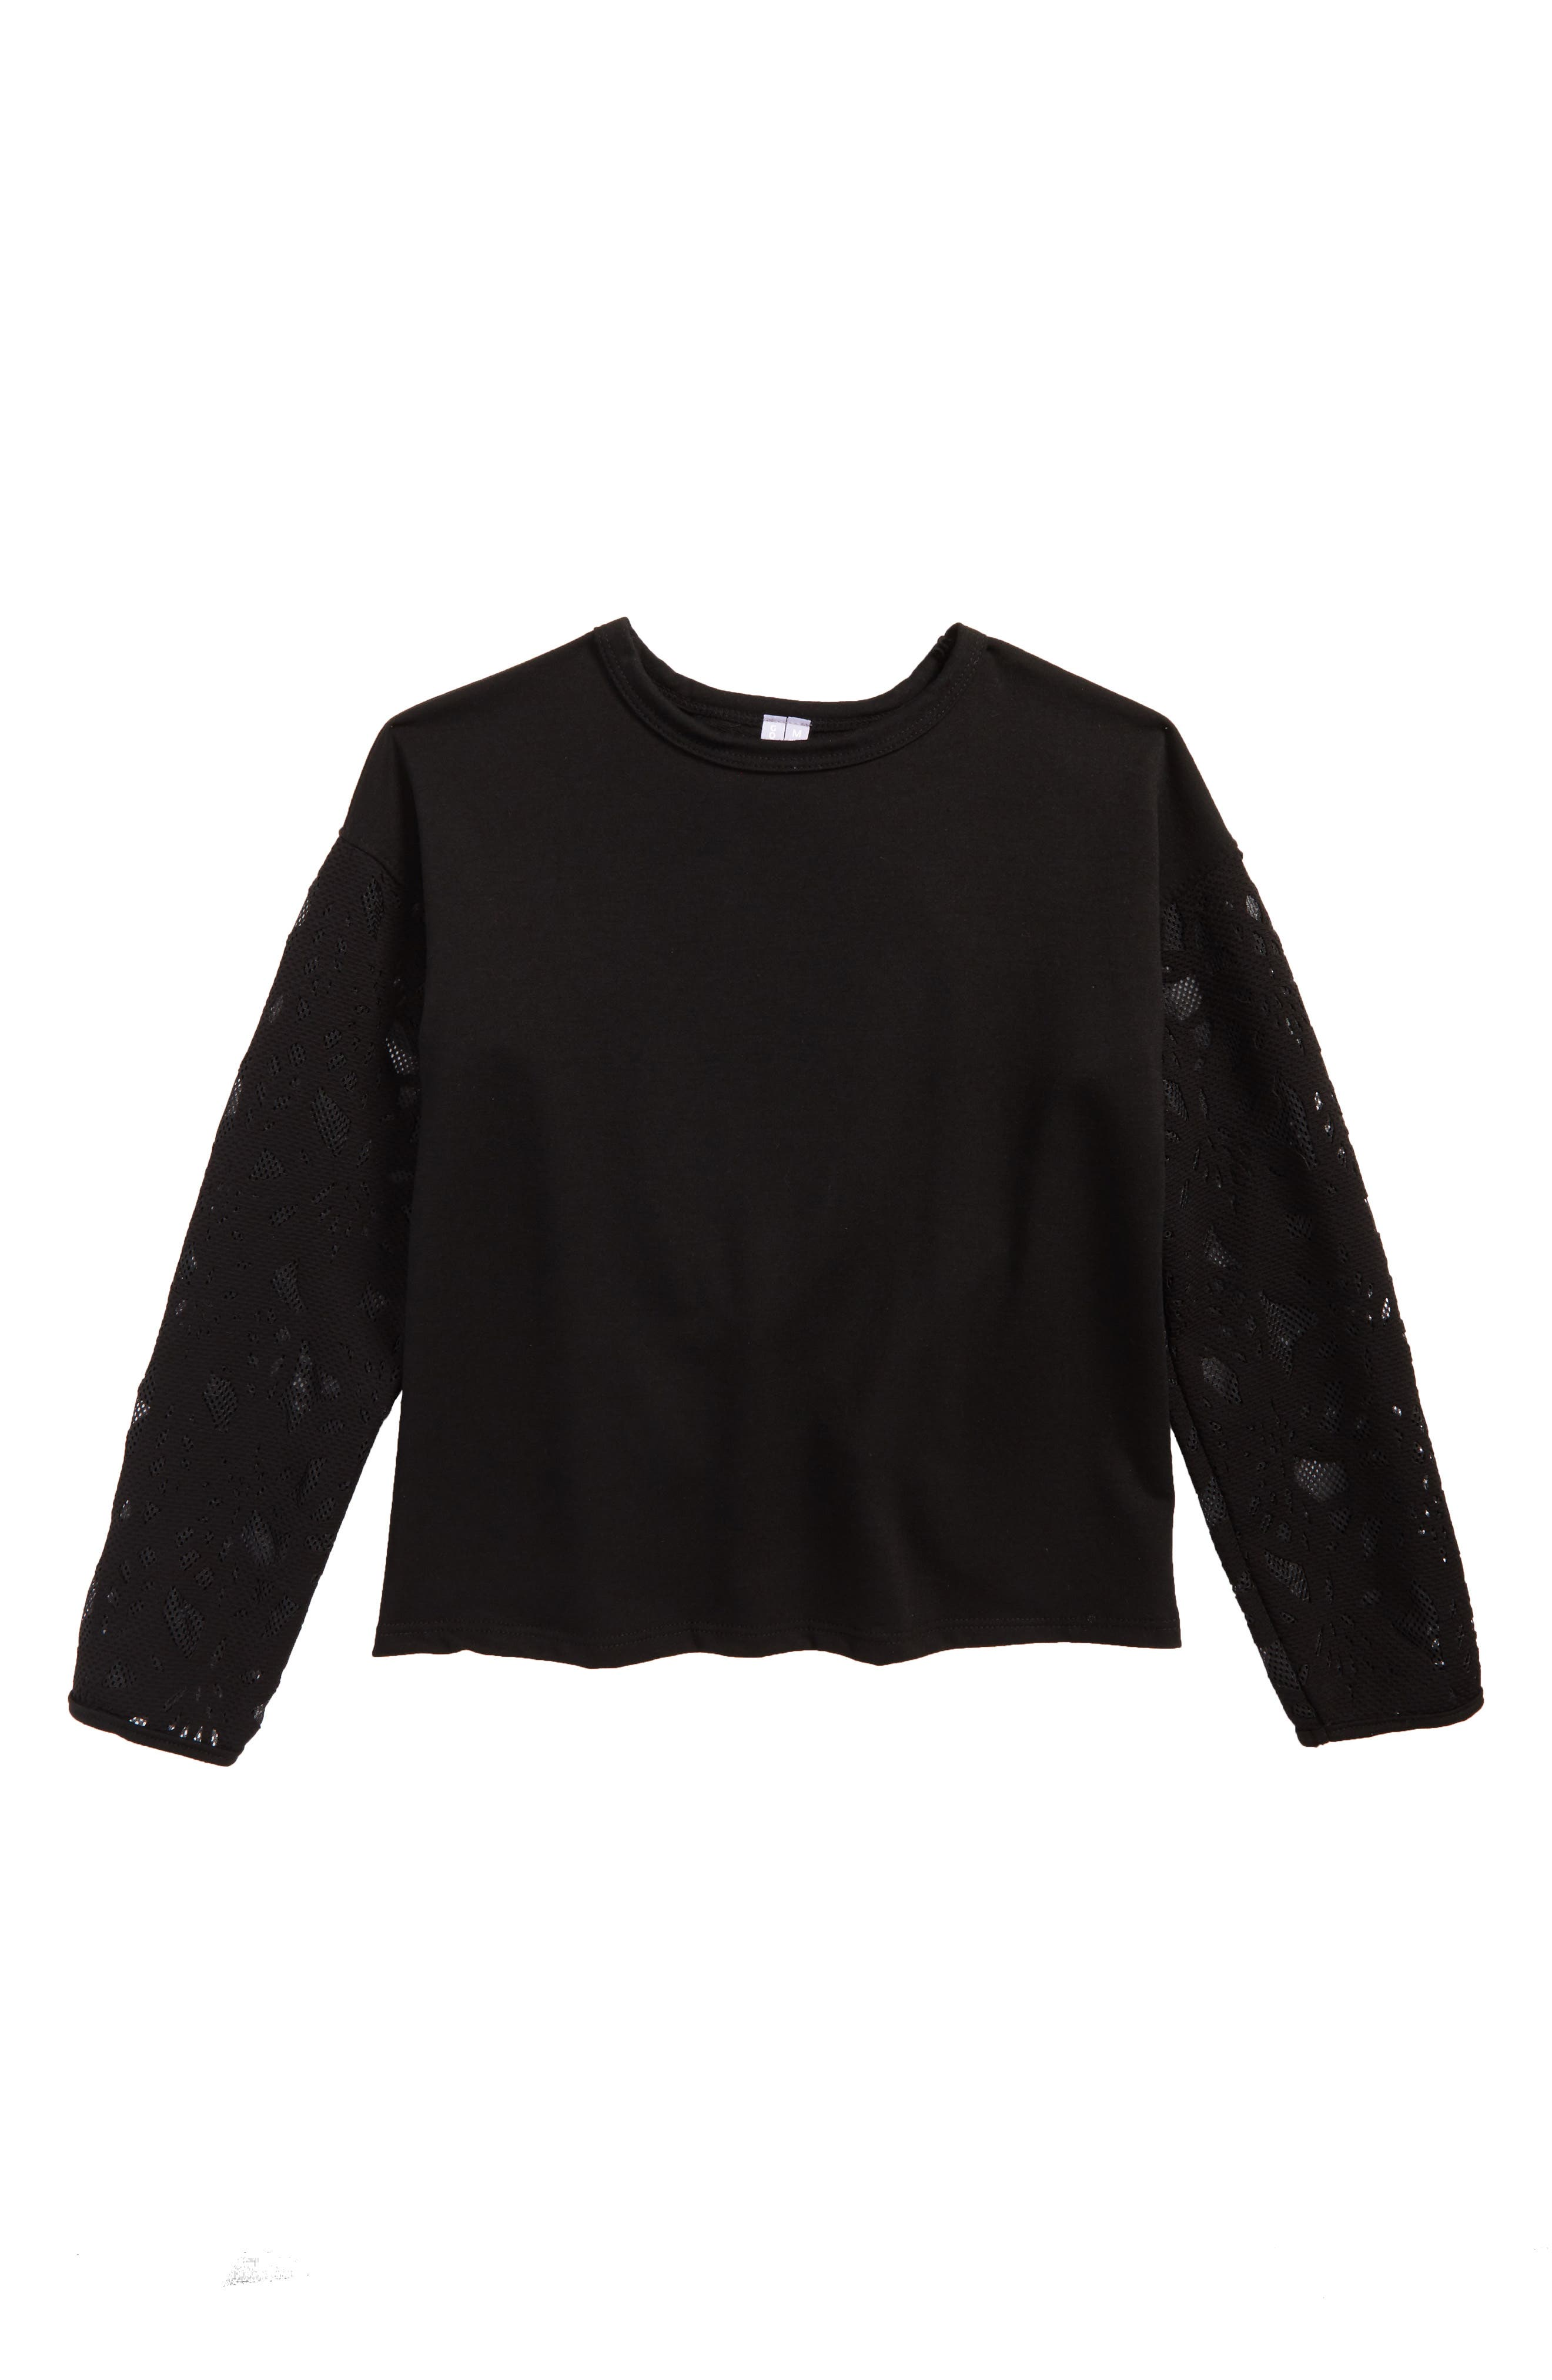 Good Luck Gem Contrast Sleeve Sweatshirt (Big Girls)